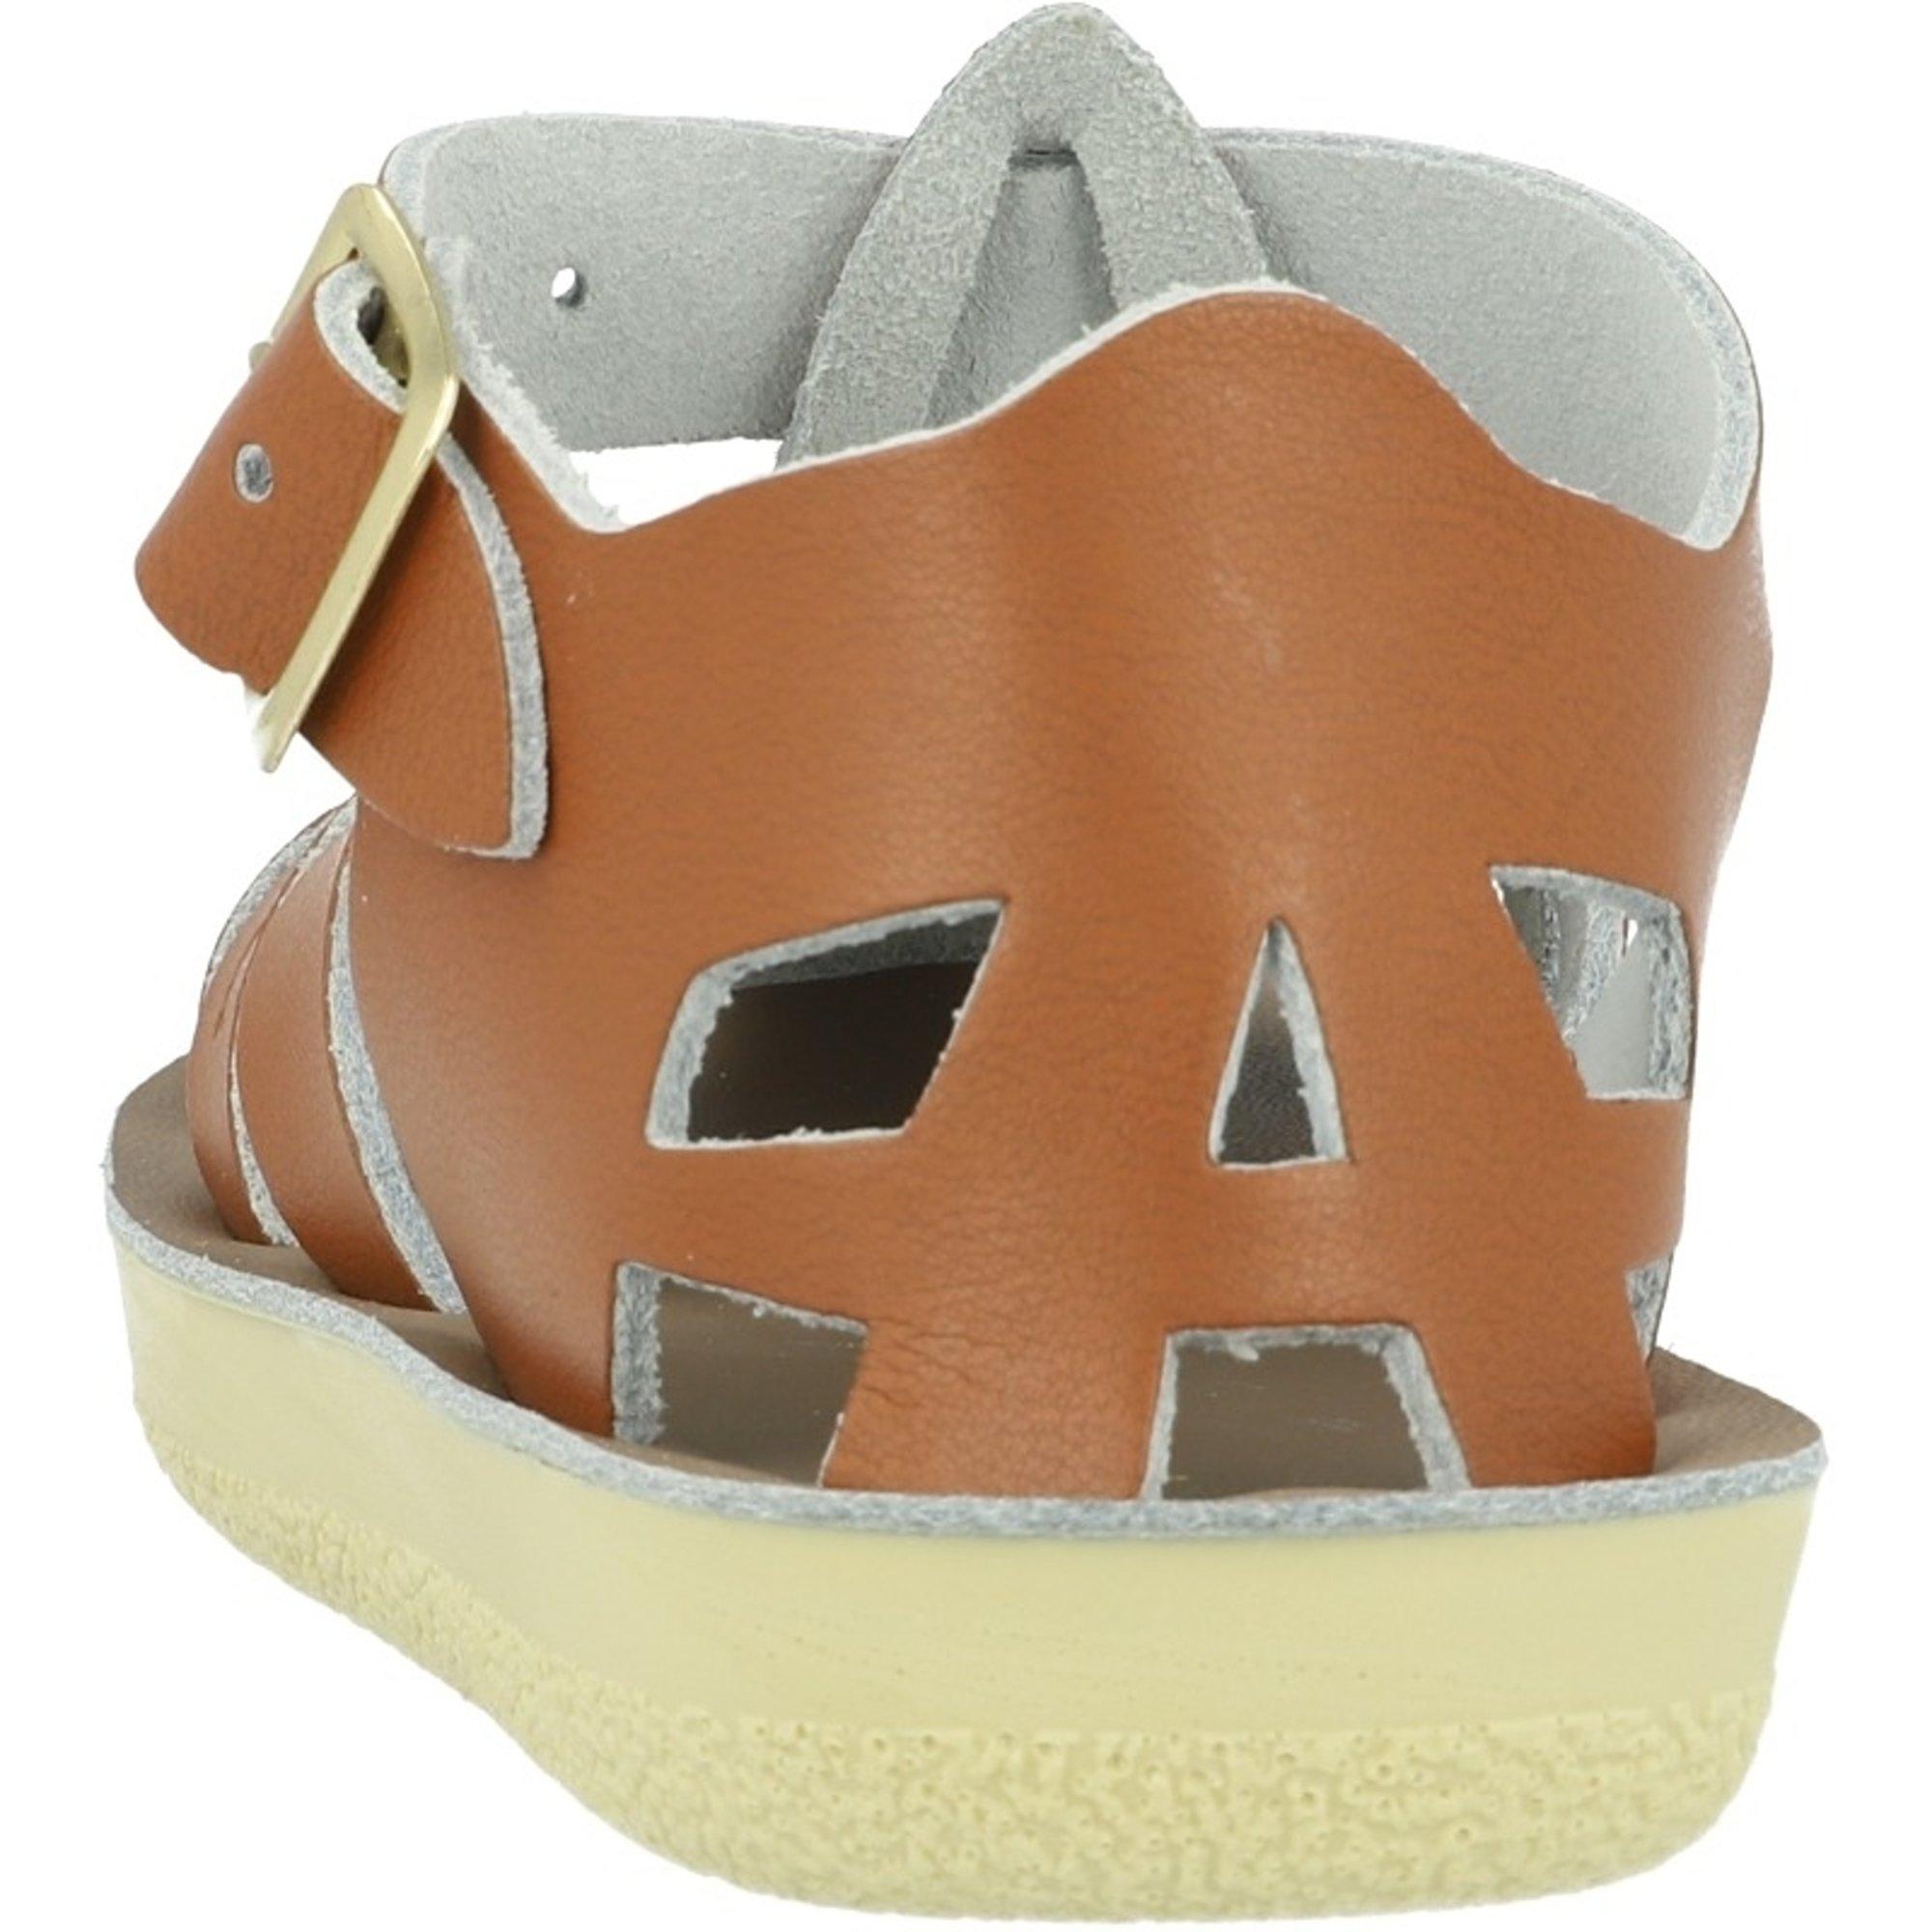 Salt Water Sandals Sun-San Shark Tan Leather